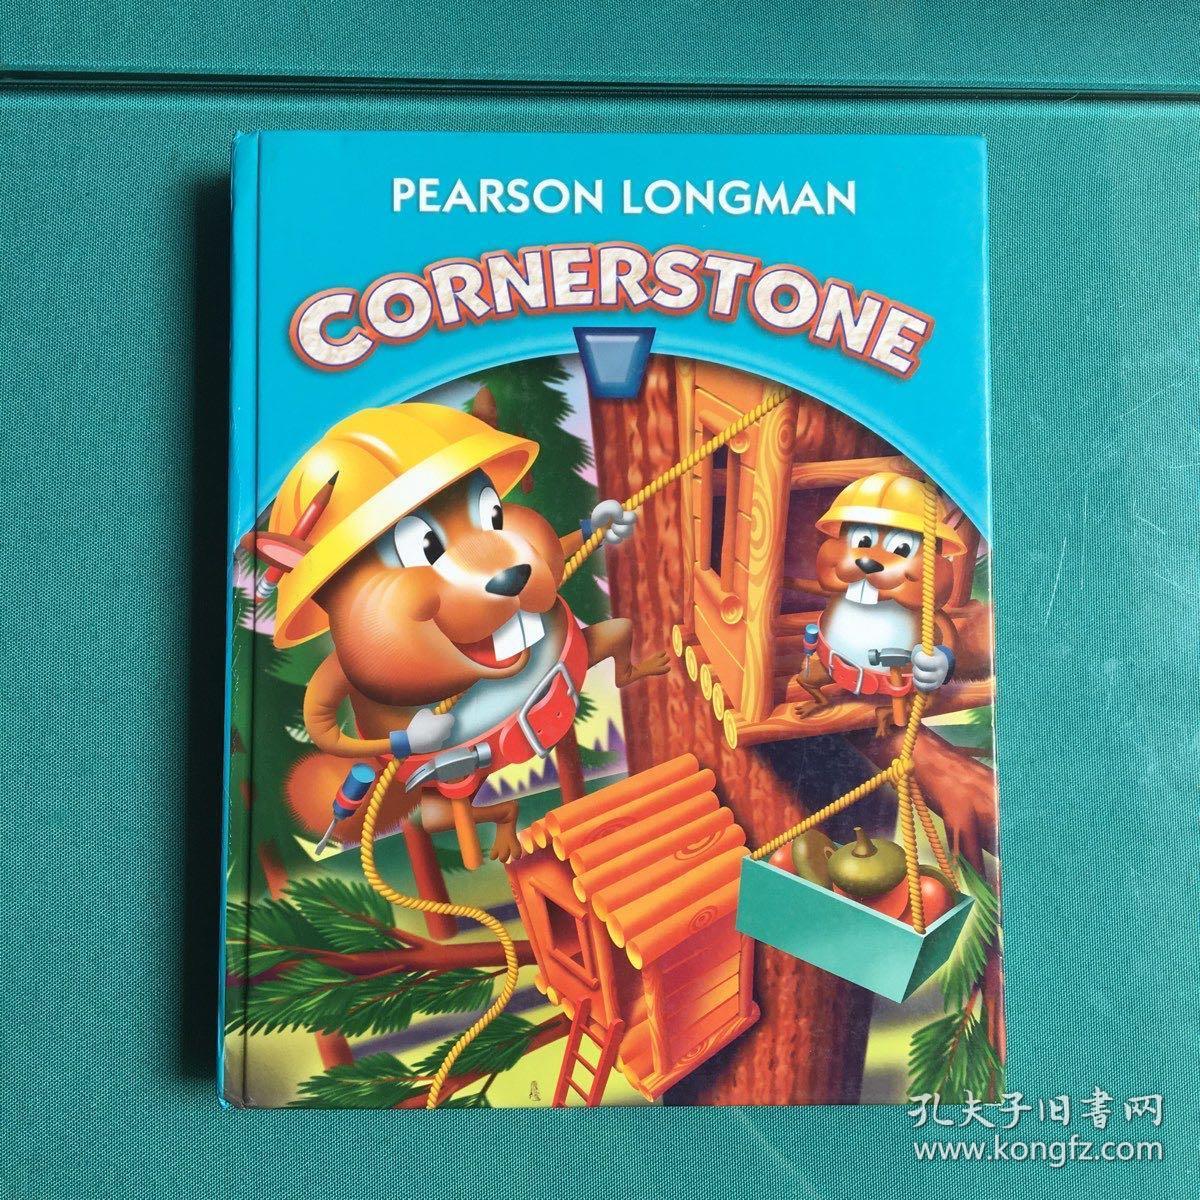 PEARSON LONGMAN CORNERSTONE